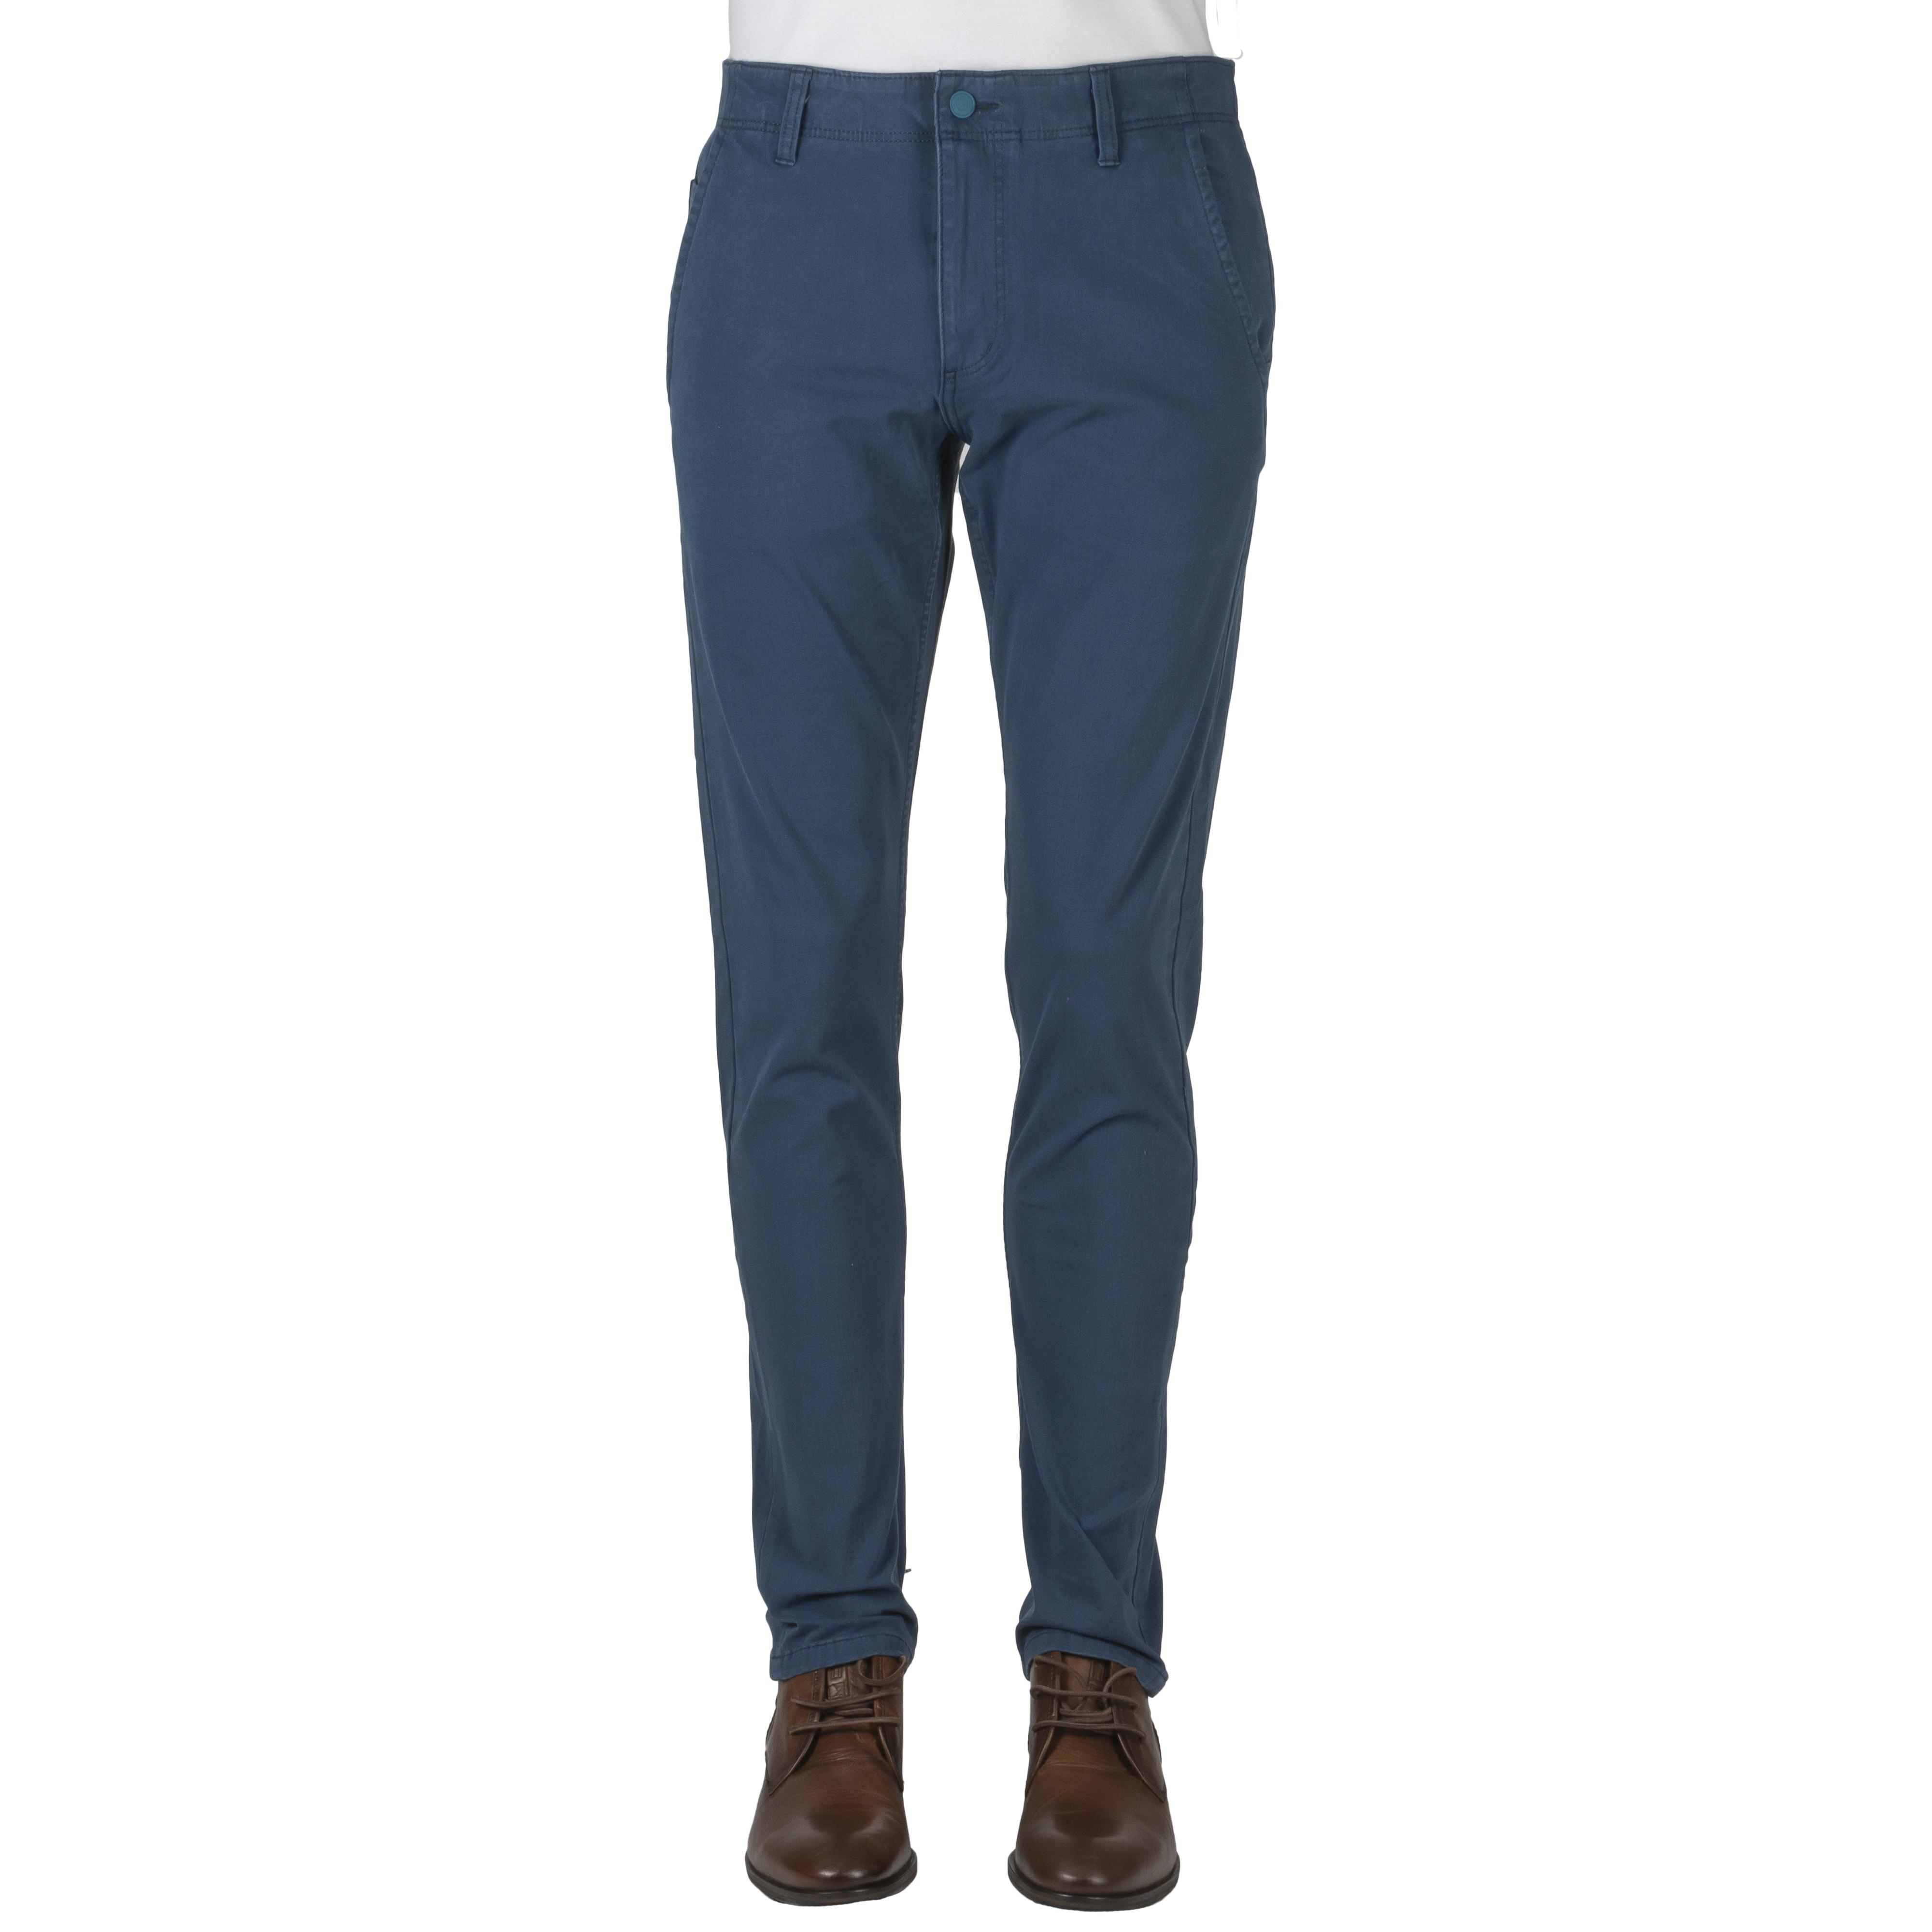 Pantalon  alpha khaki en coton stretch bleu canard